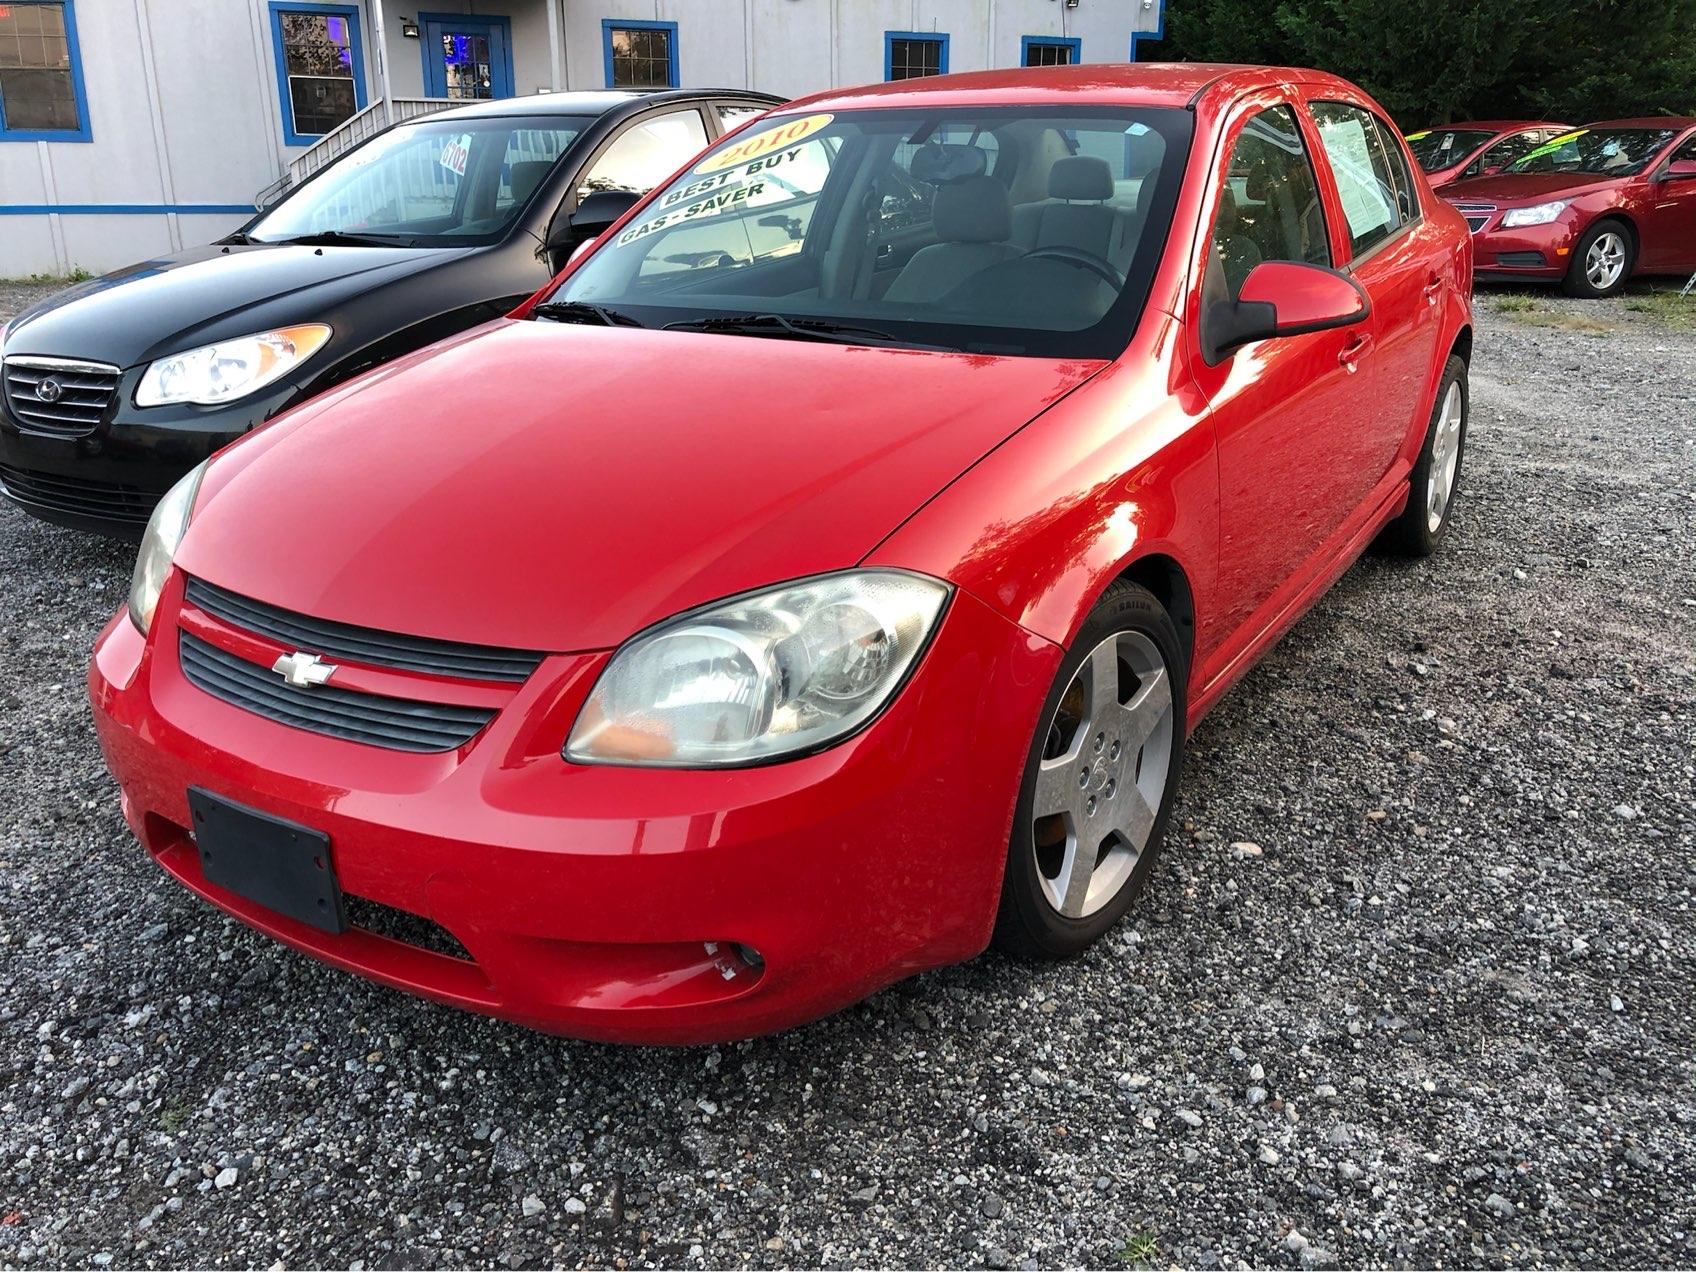 Used CHEVROLET COBALT 2010 MASTERCARS AUTO SALES LT W/2LT